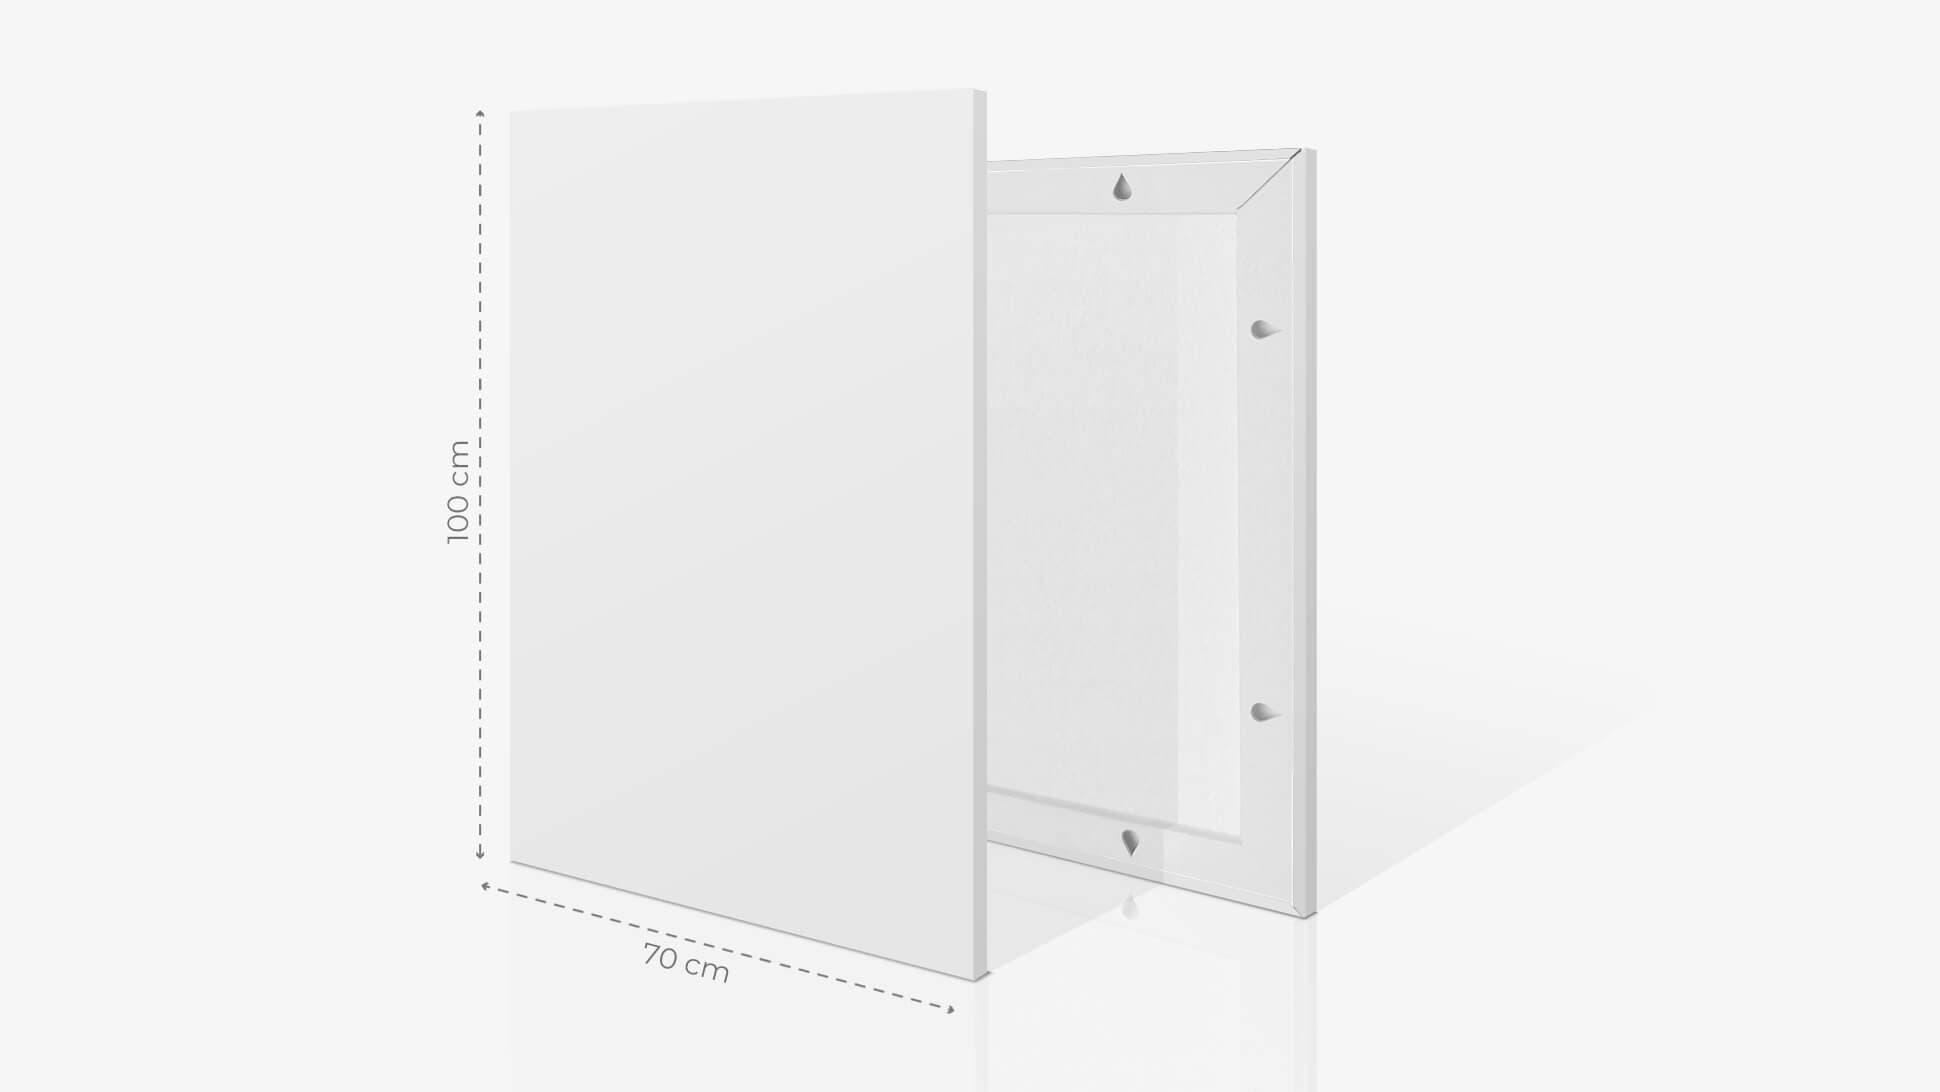 Fotoquadro 70x100 cm | tictac.it